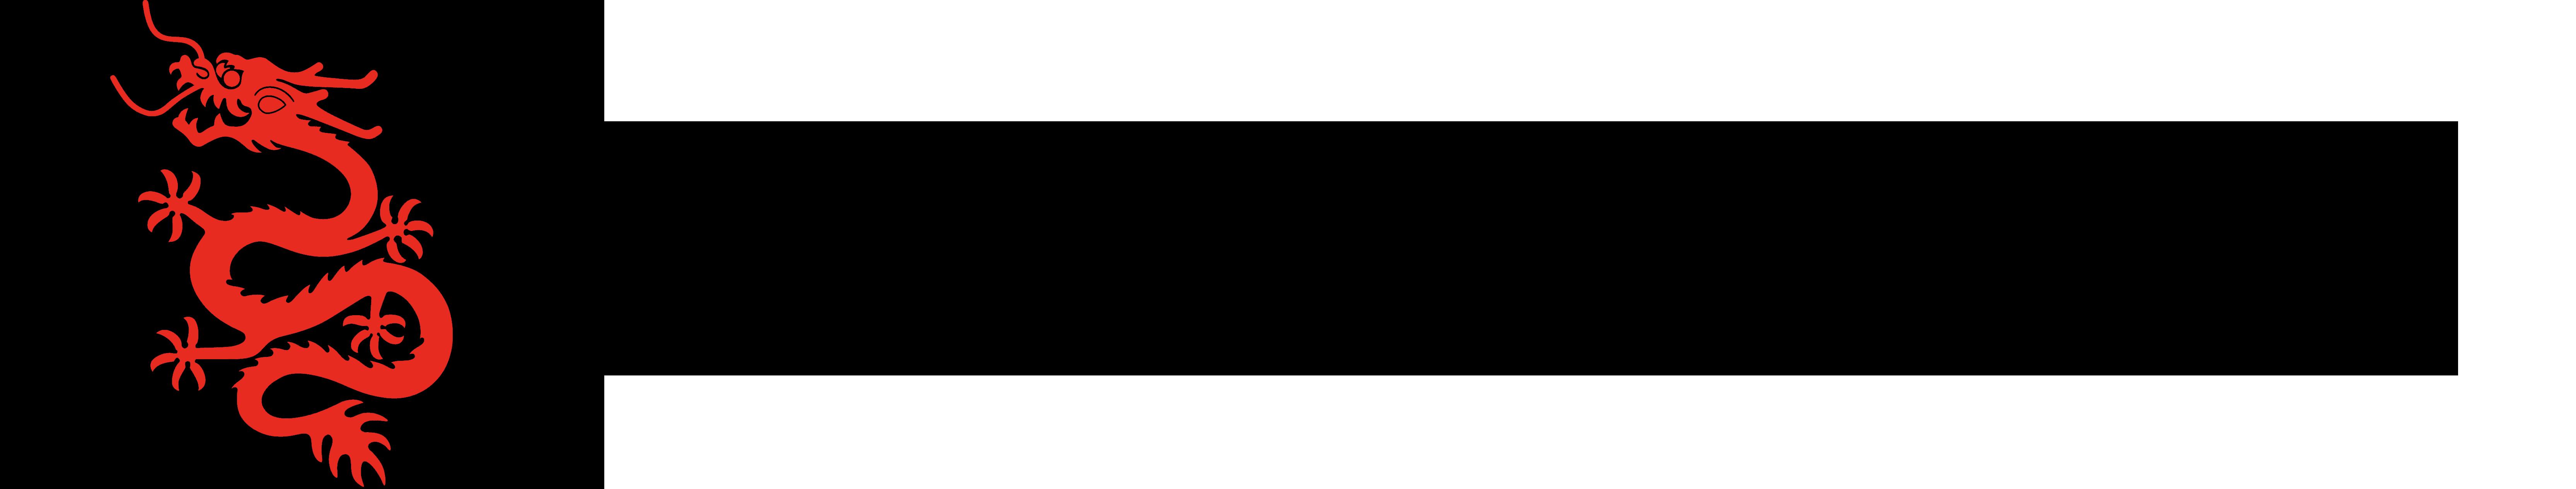 Dragonair Logo, Horizontal - Dragonair, Transparent background PNG HD thumbnail